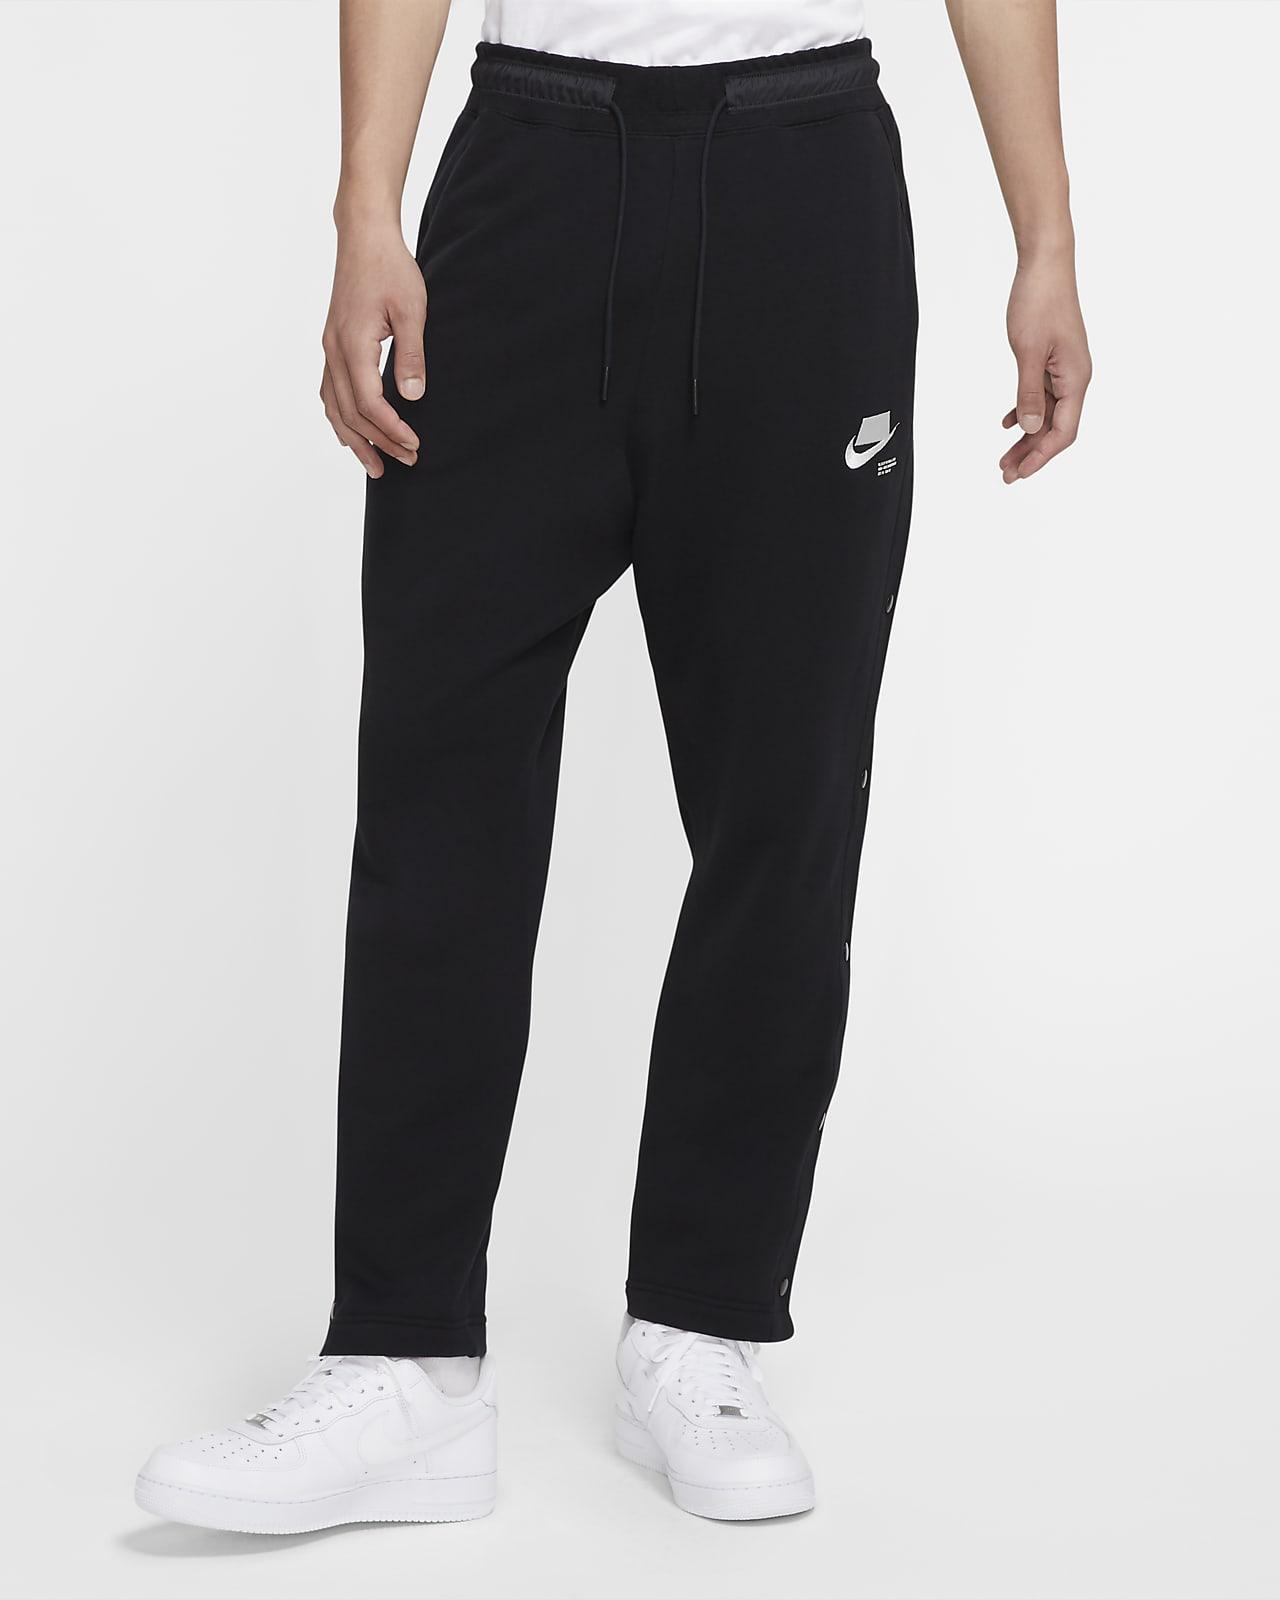 Nike Sportswear NSW 男款法國毛圈布長褲